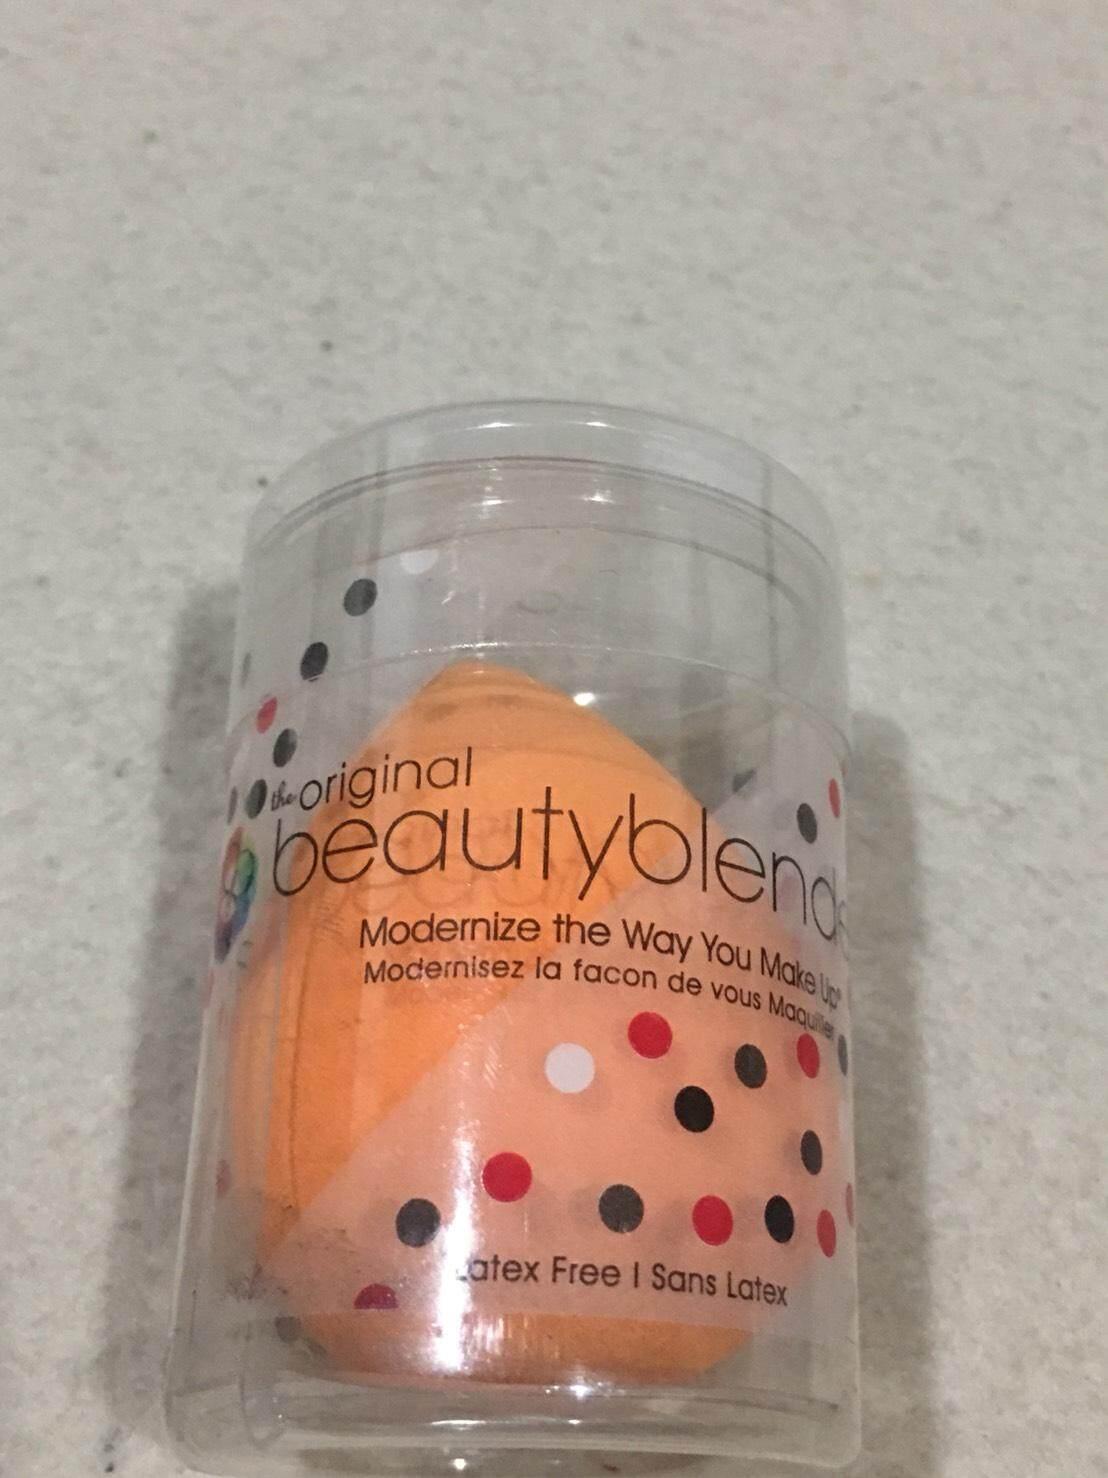 Beautyblender Original - Intl ✿ฟองน้ำแต่งหน้า-เกลี่ยรองพื้น รูปไข่✿.